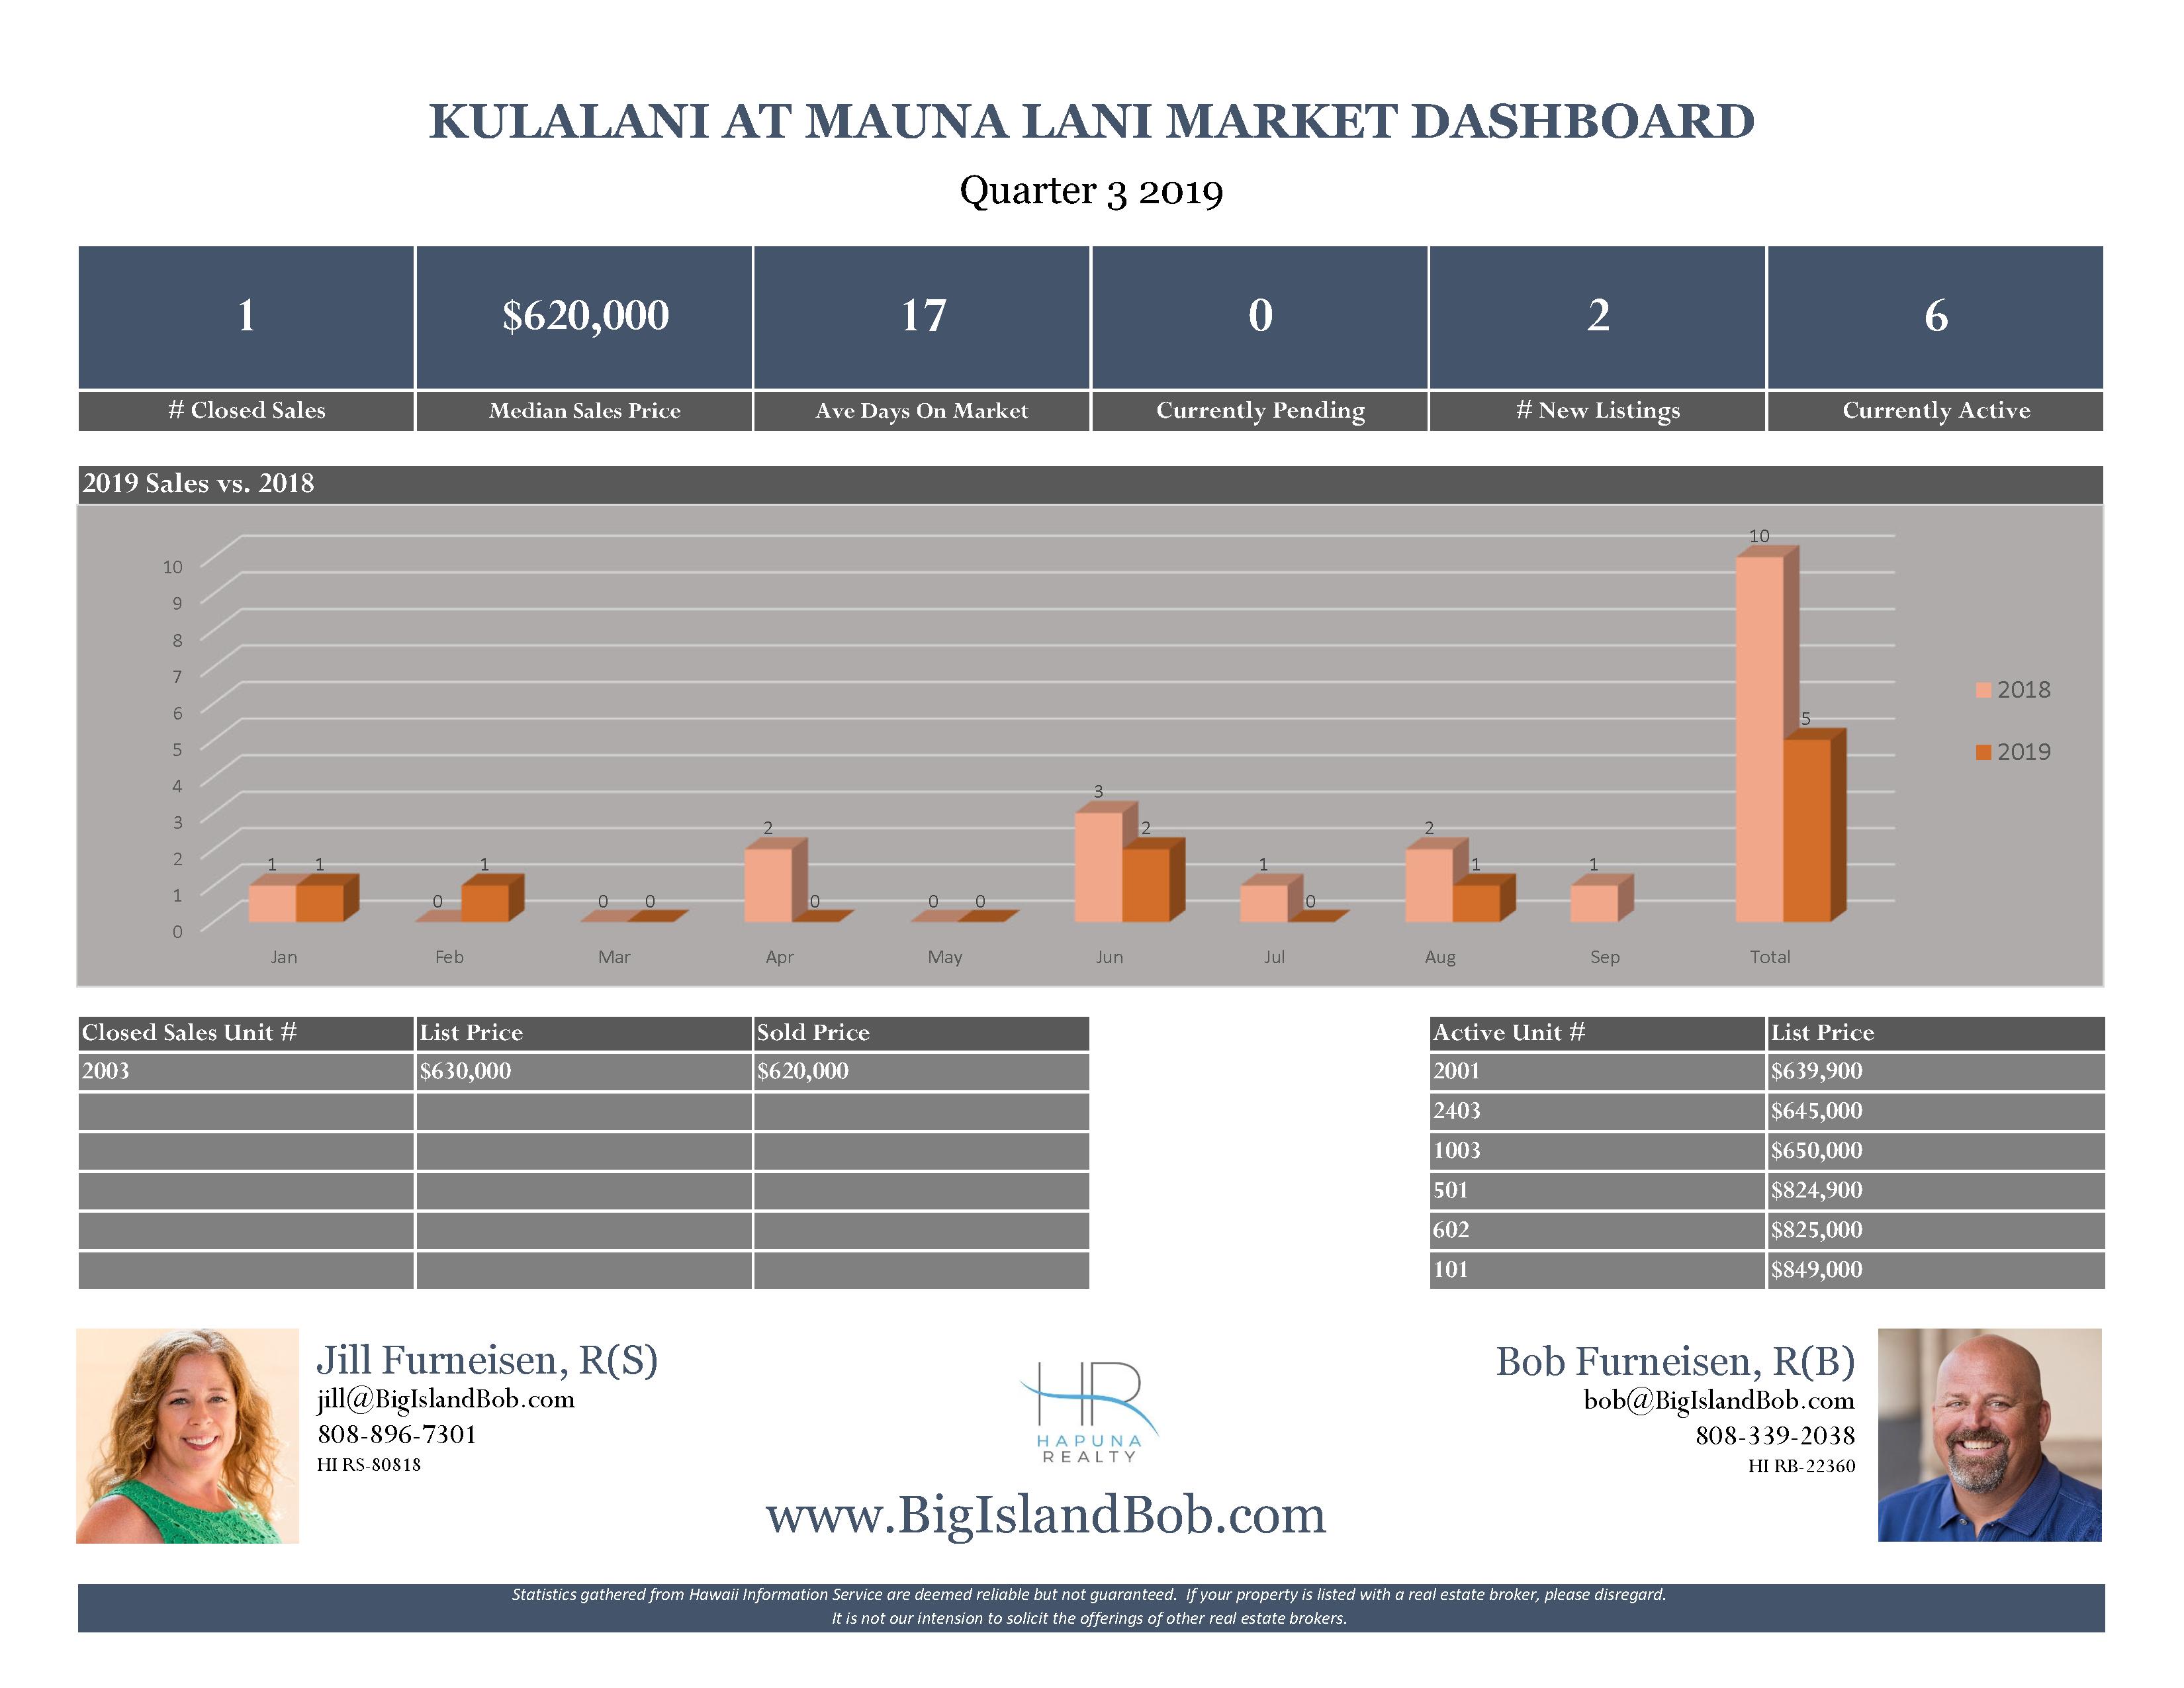 Kulalani at Mauna Lani Quarter 3 2019 Real Estate Market Dashboard